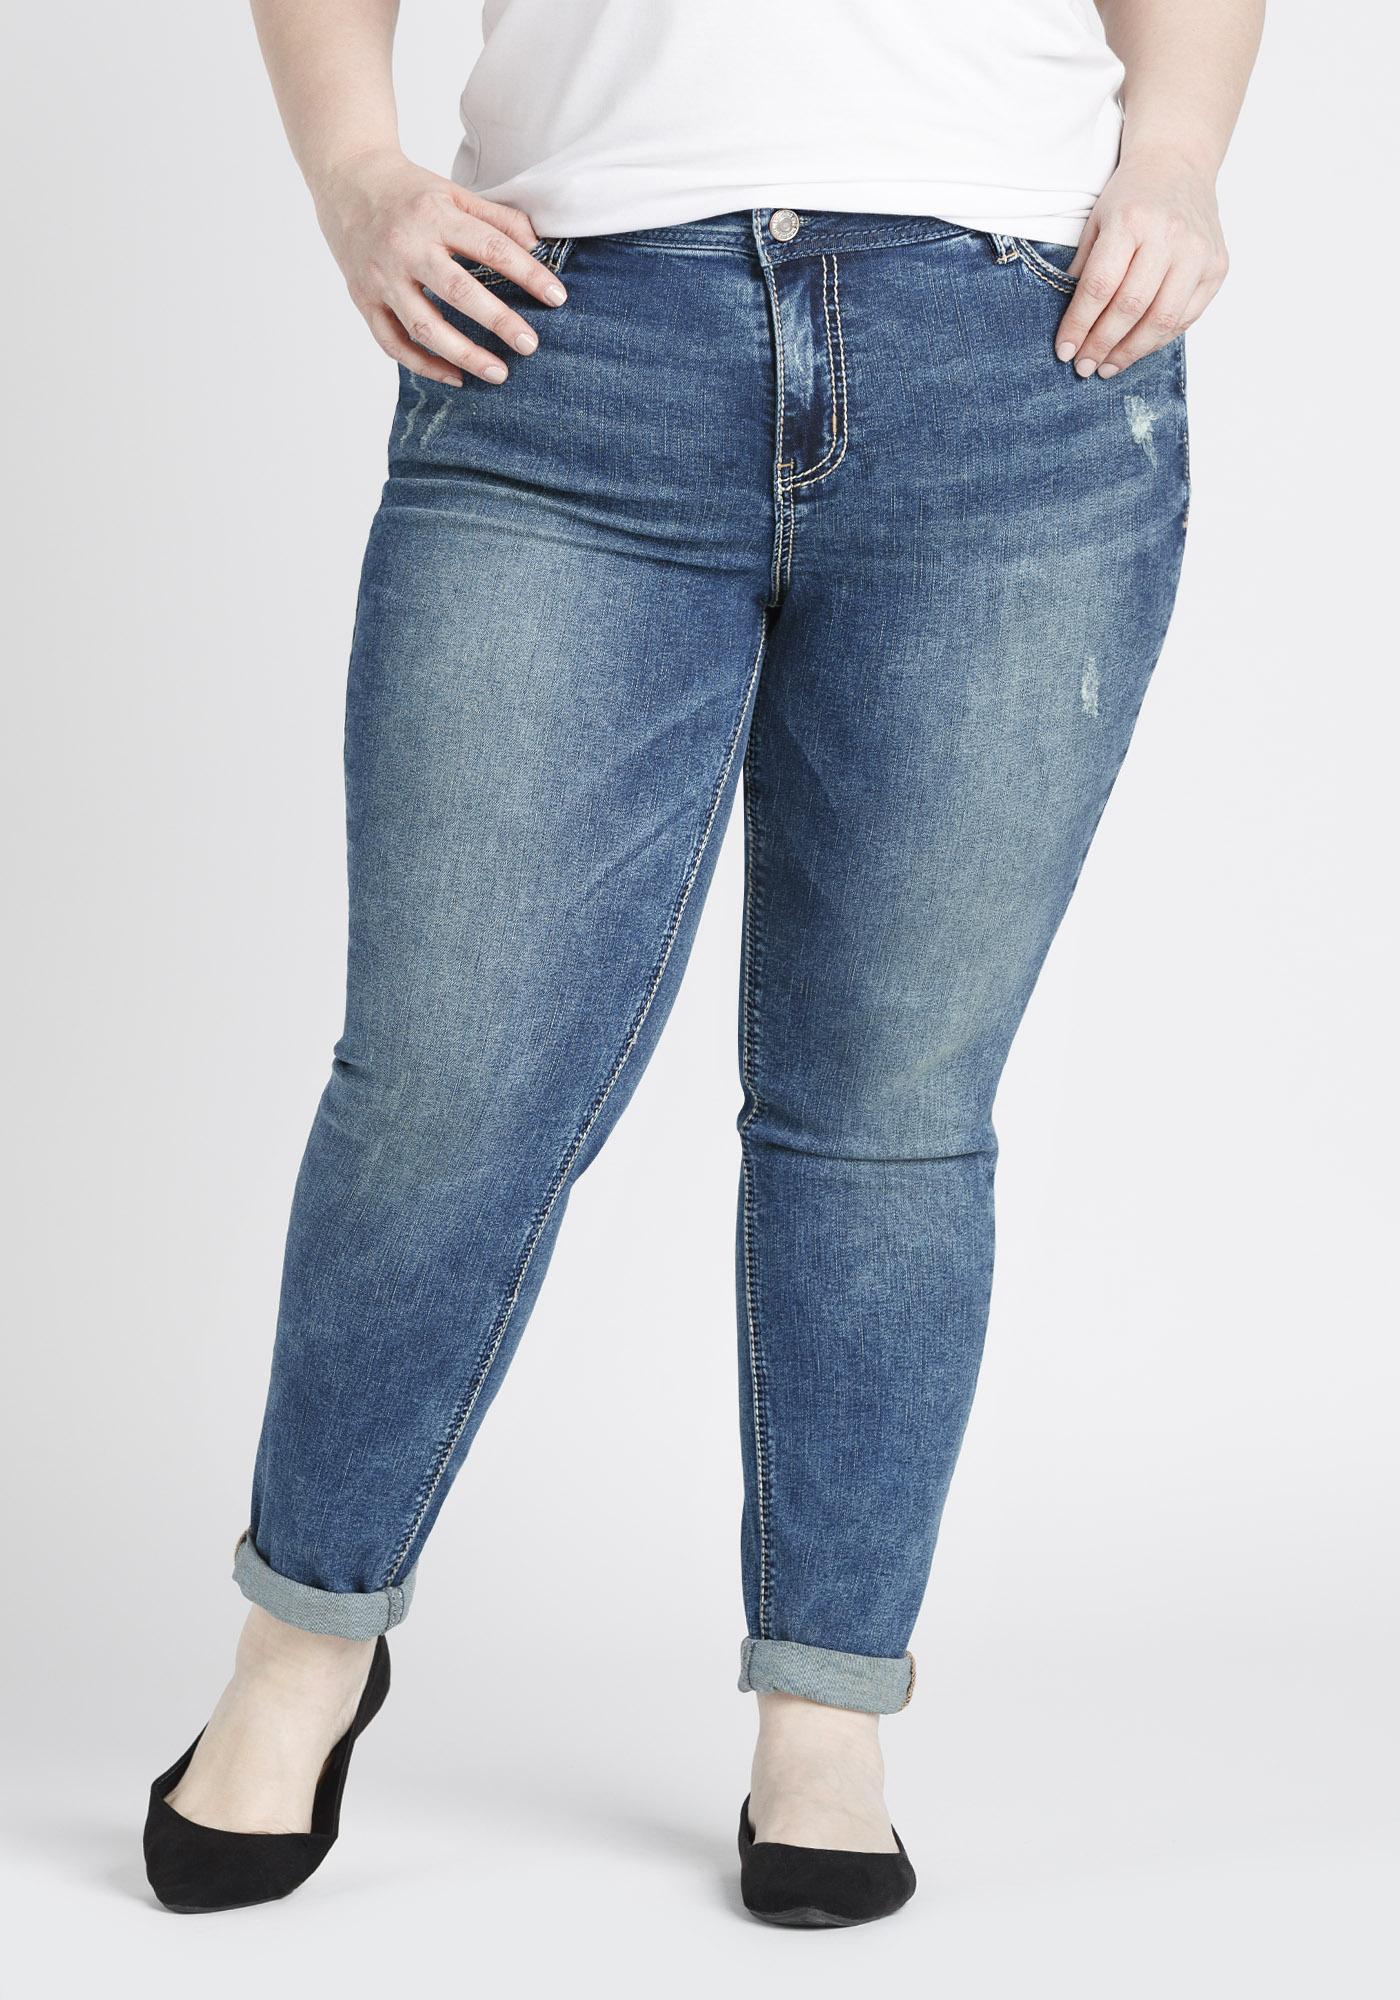 65225d123590f Women's Plus Size Girlfriend Jeans, DARK WASH, hi-res